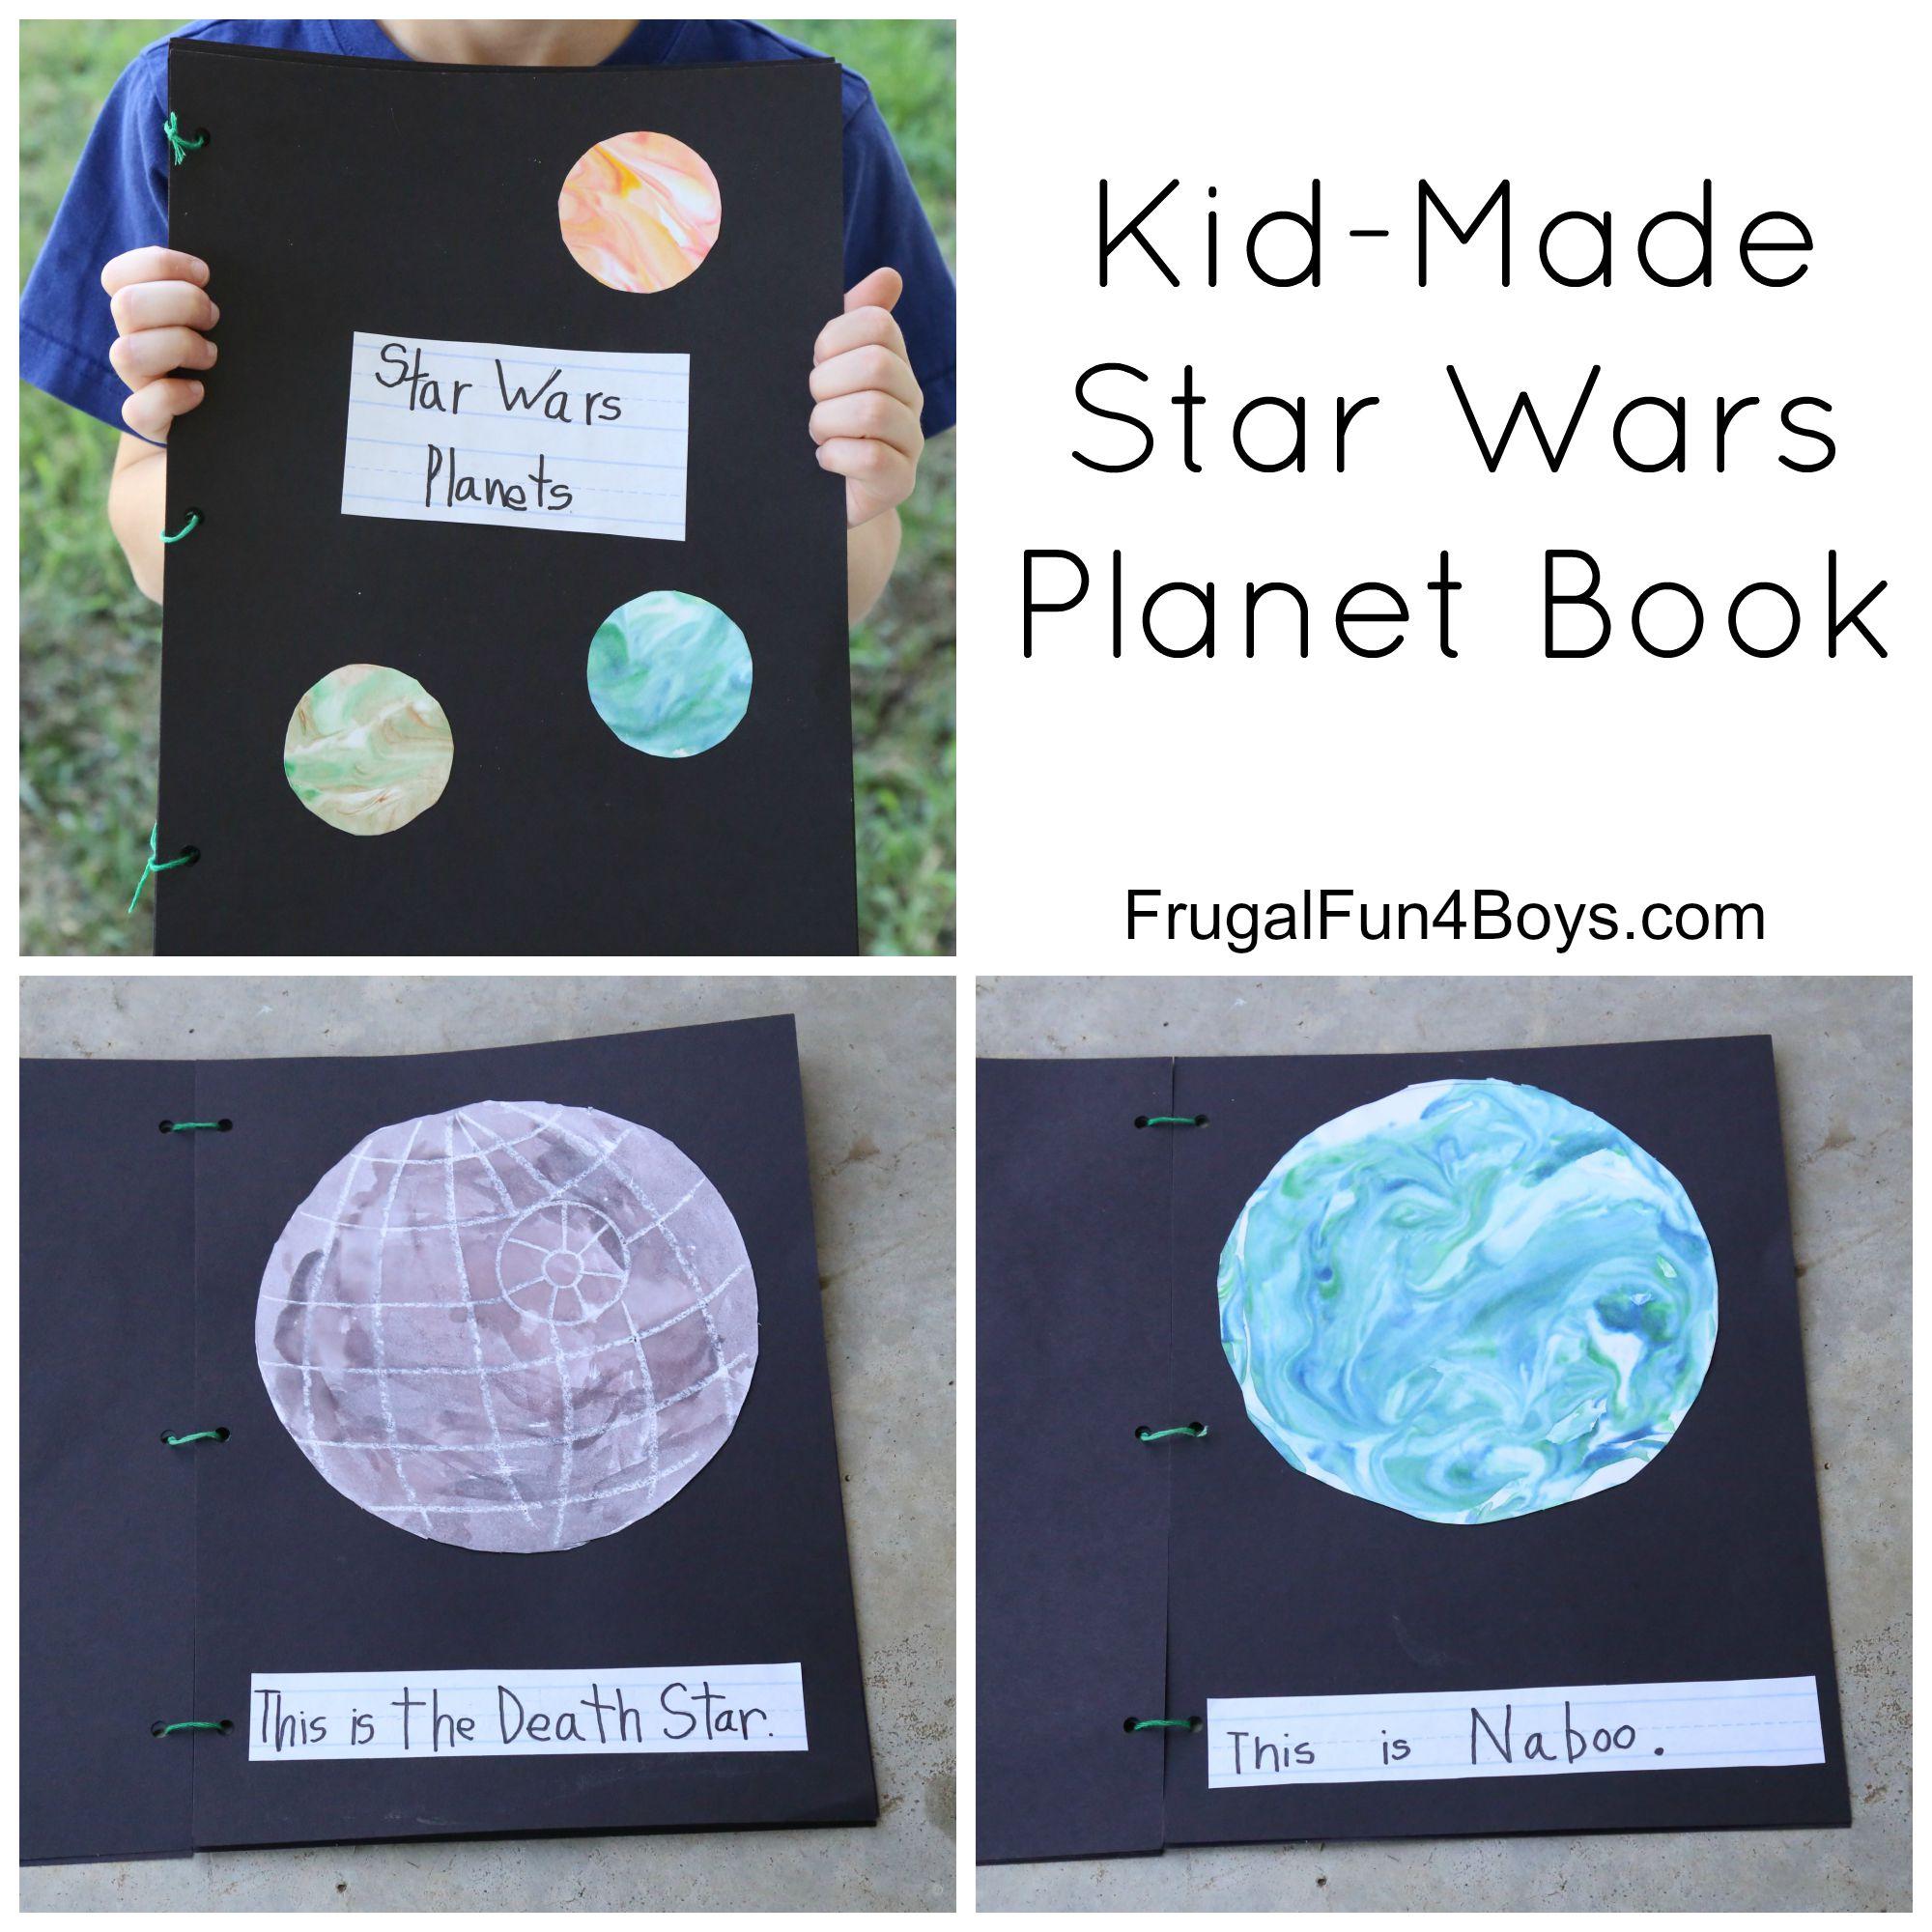 Kid-Made Star Wars Planet Book